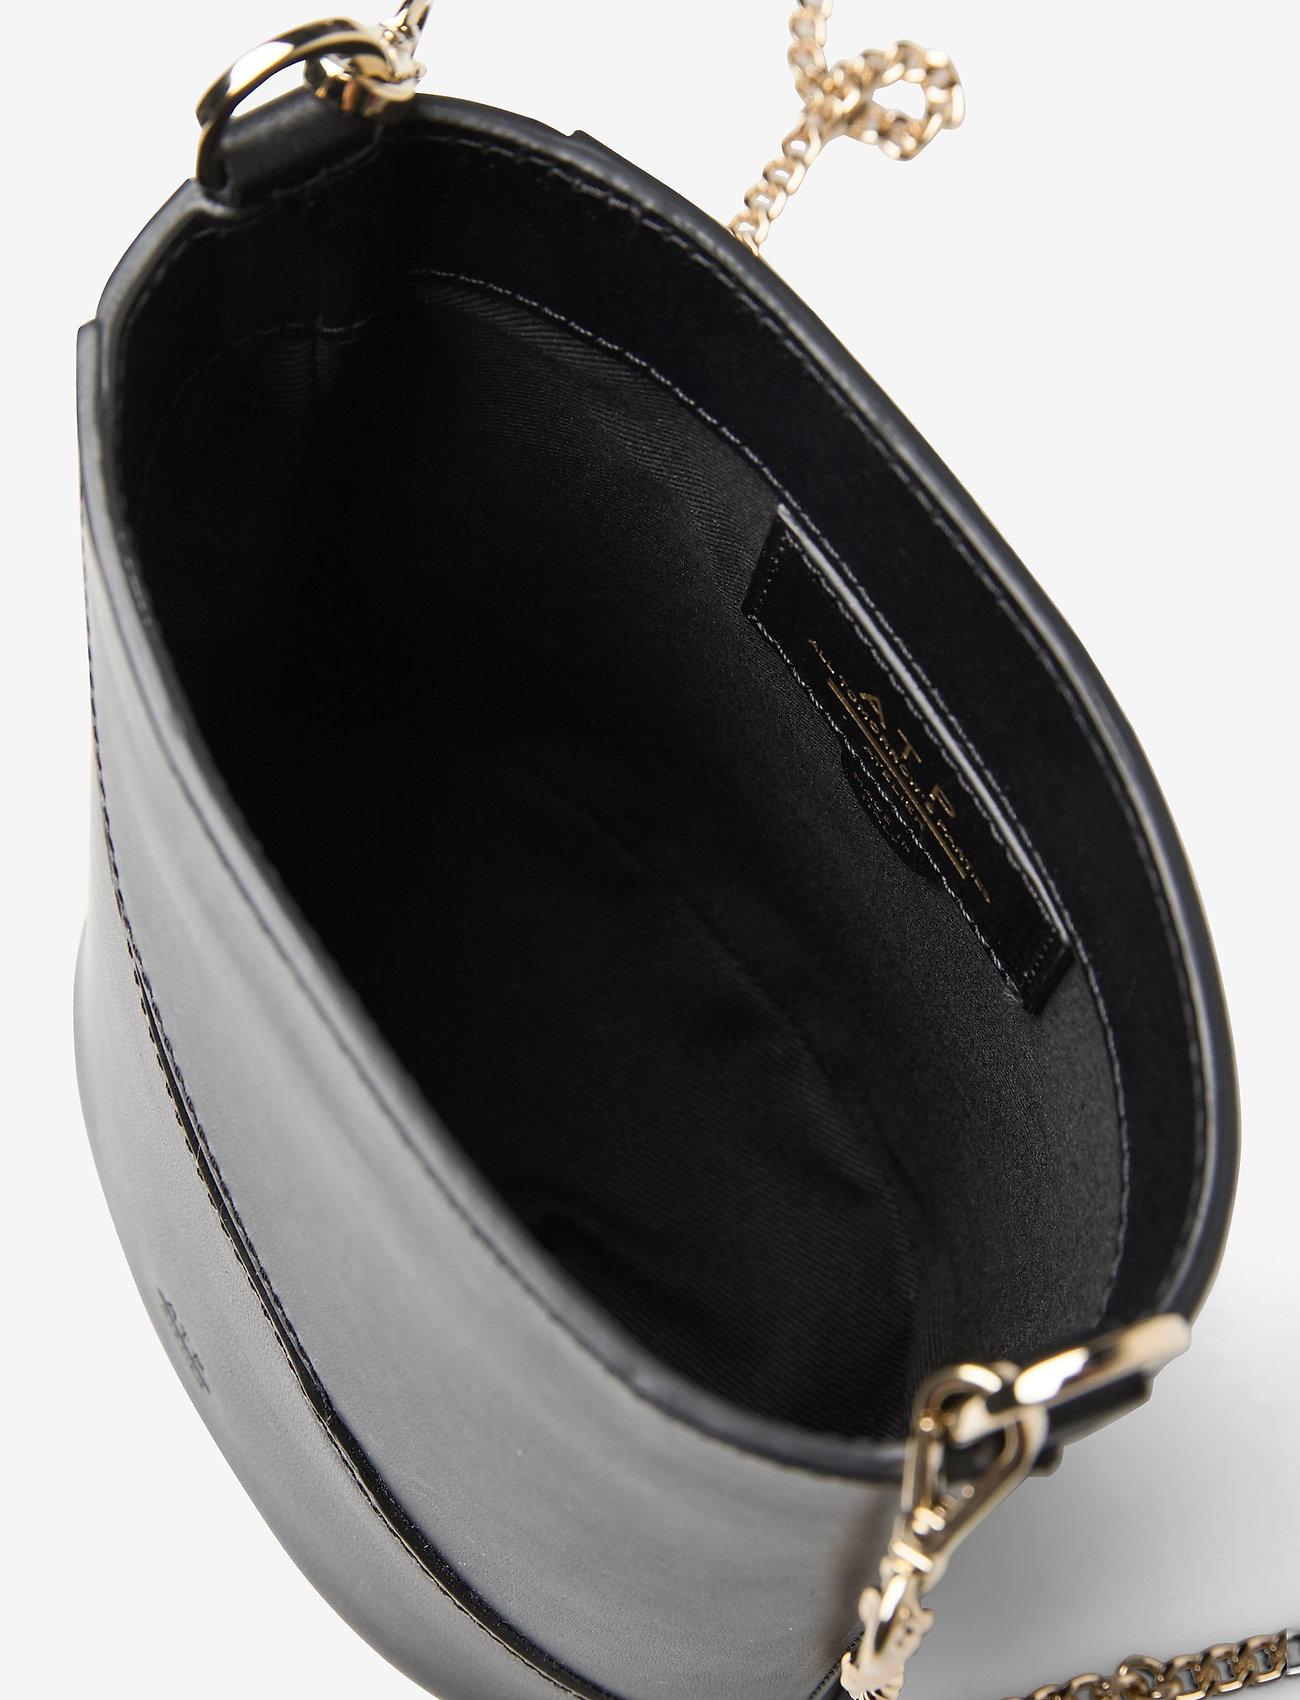 ATP Atelier - Faeto Vacchetta - bucket bags - black - 3